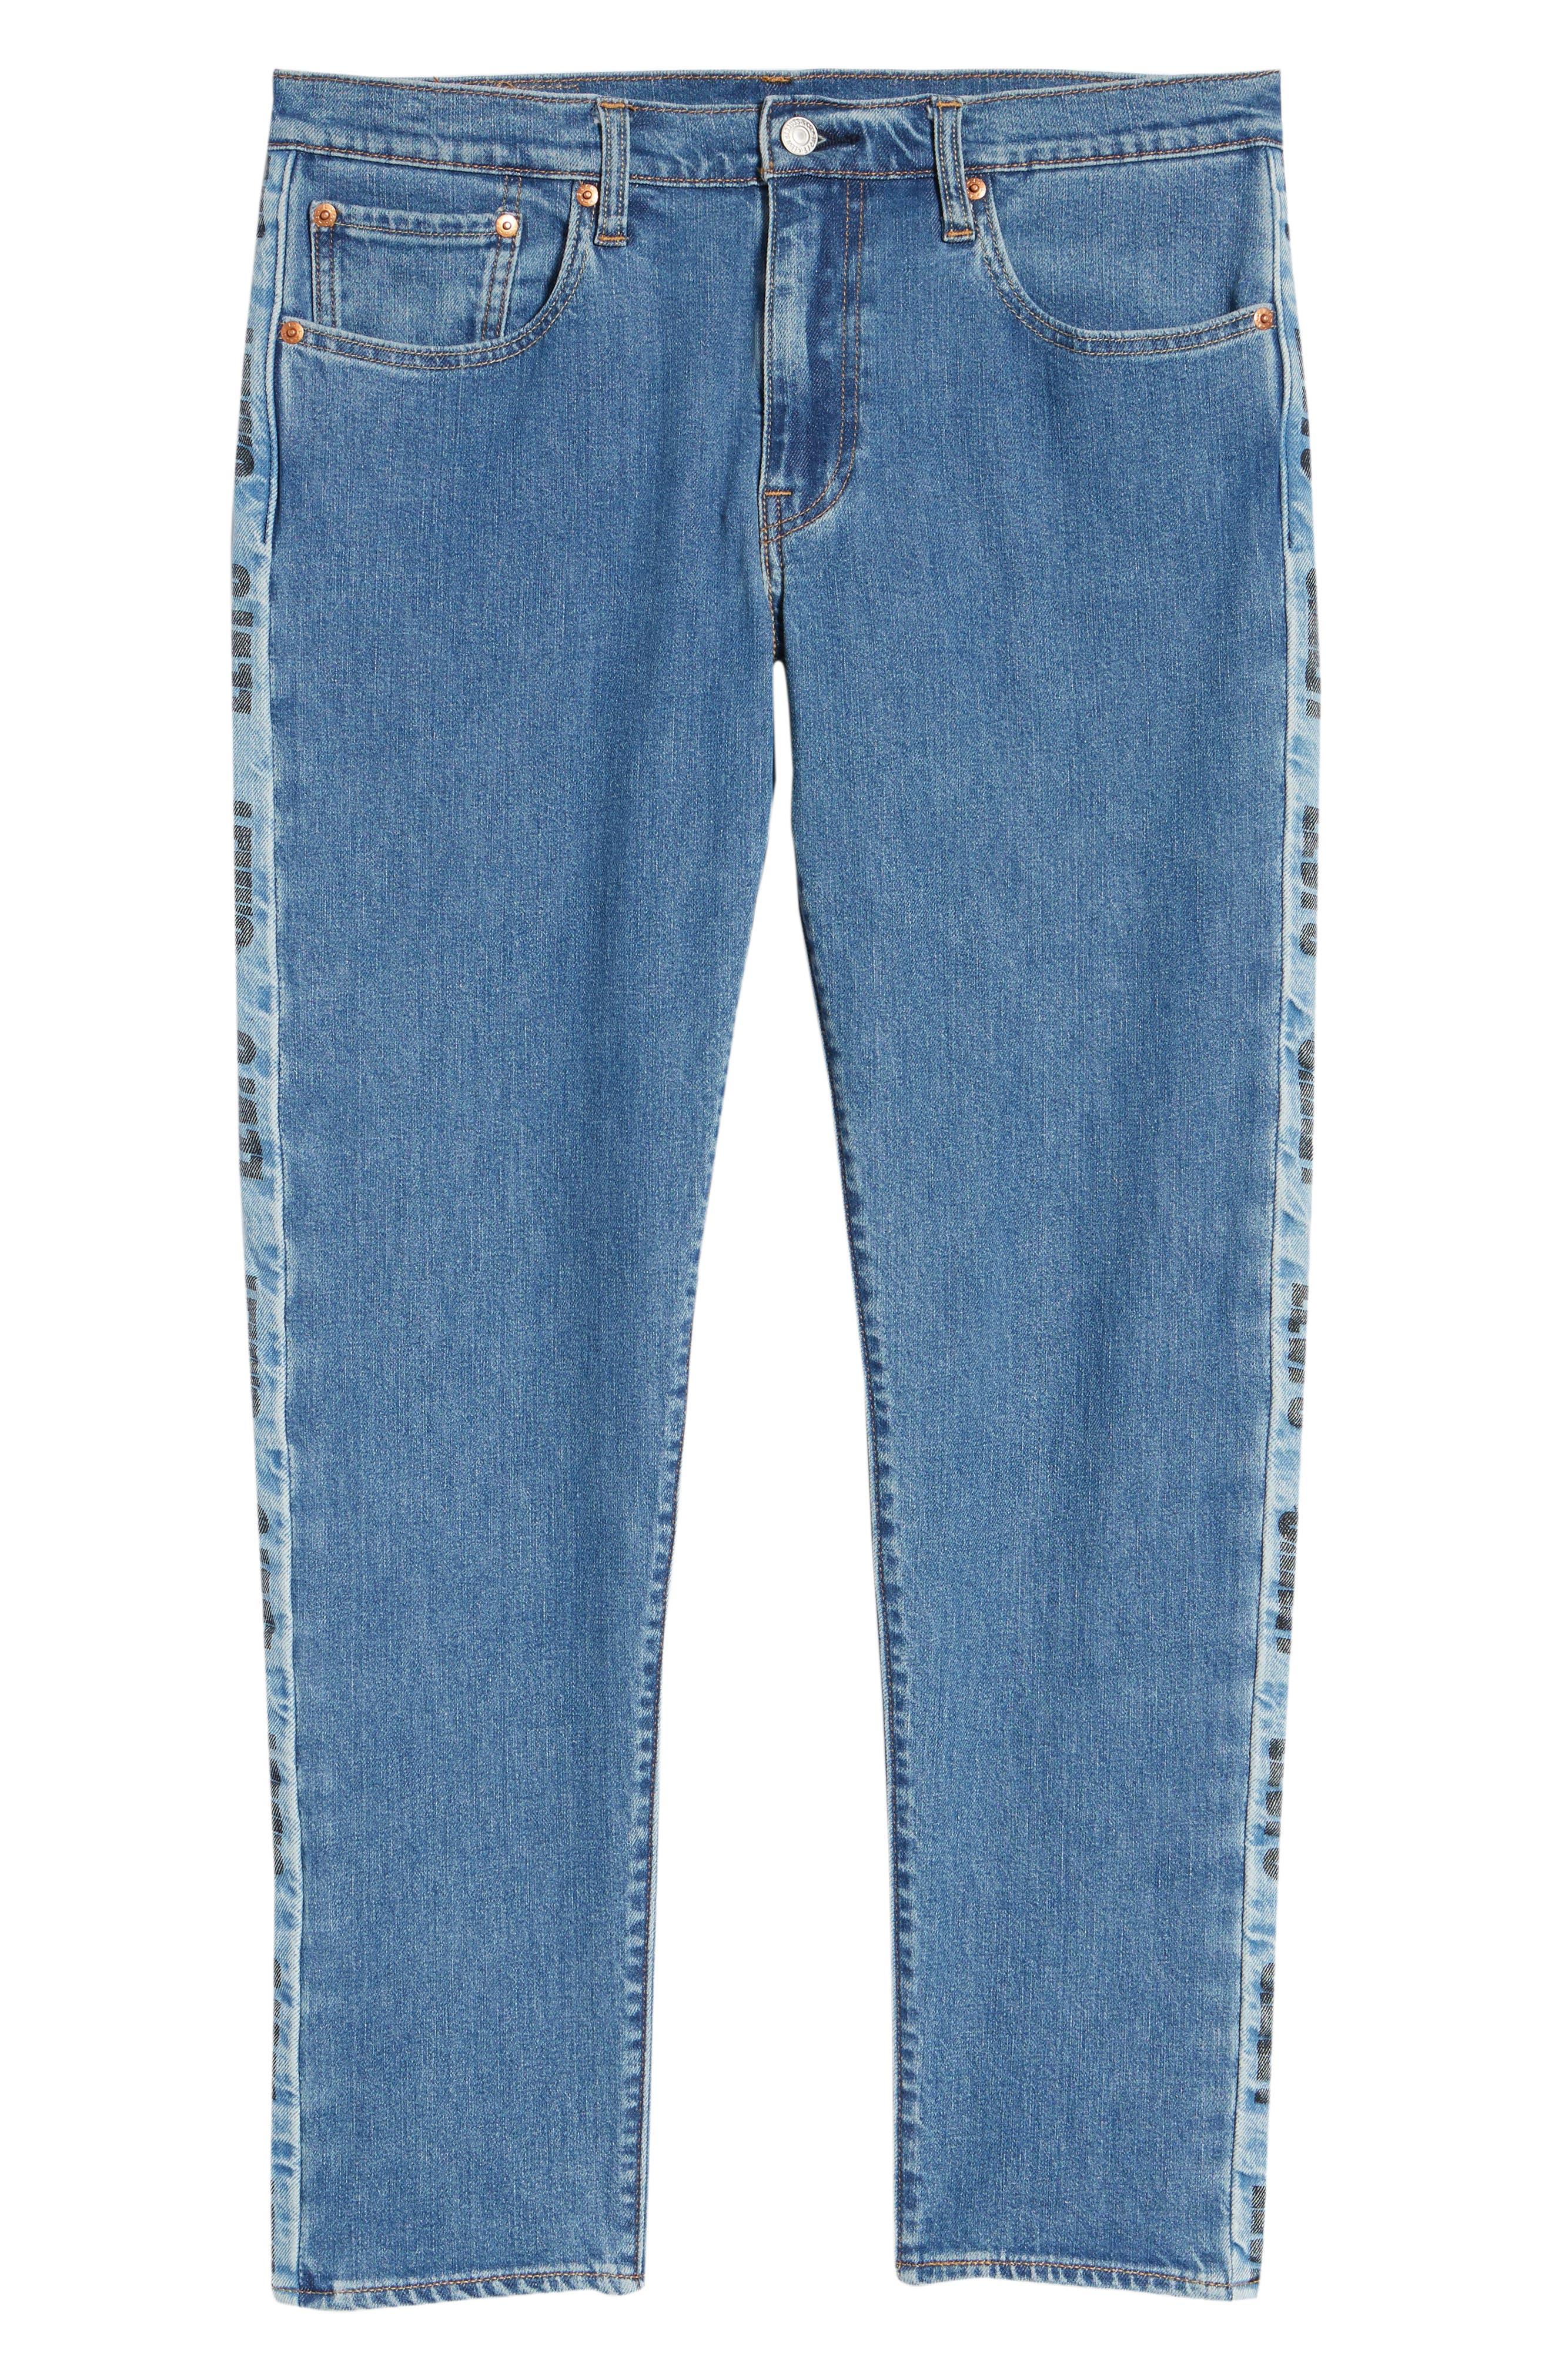 Hi-Ball Straight Leg Jeans,                             Alternate thumbnail 6, color,                             MEDIUM BLUE